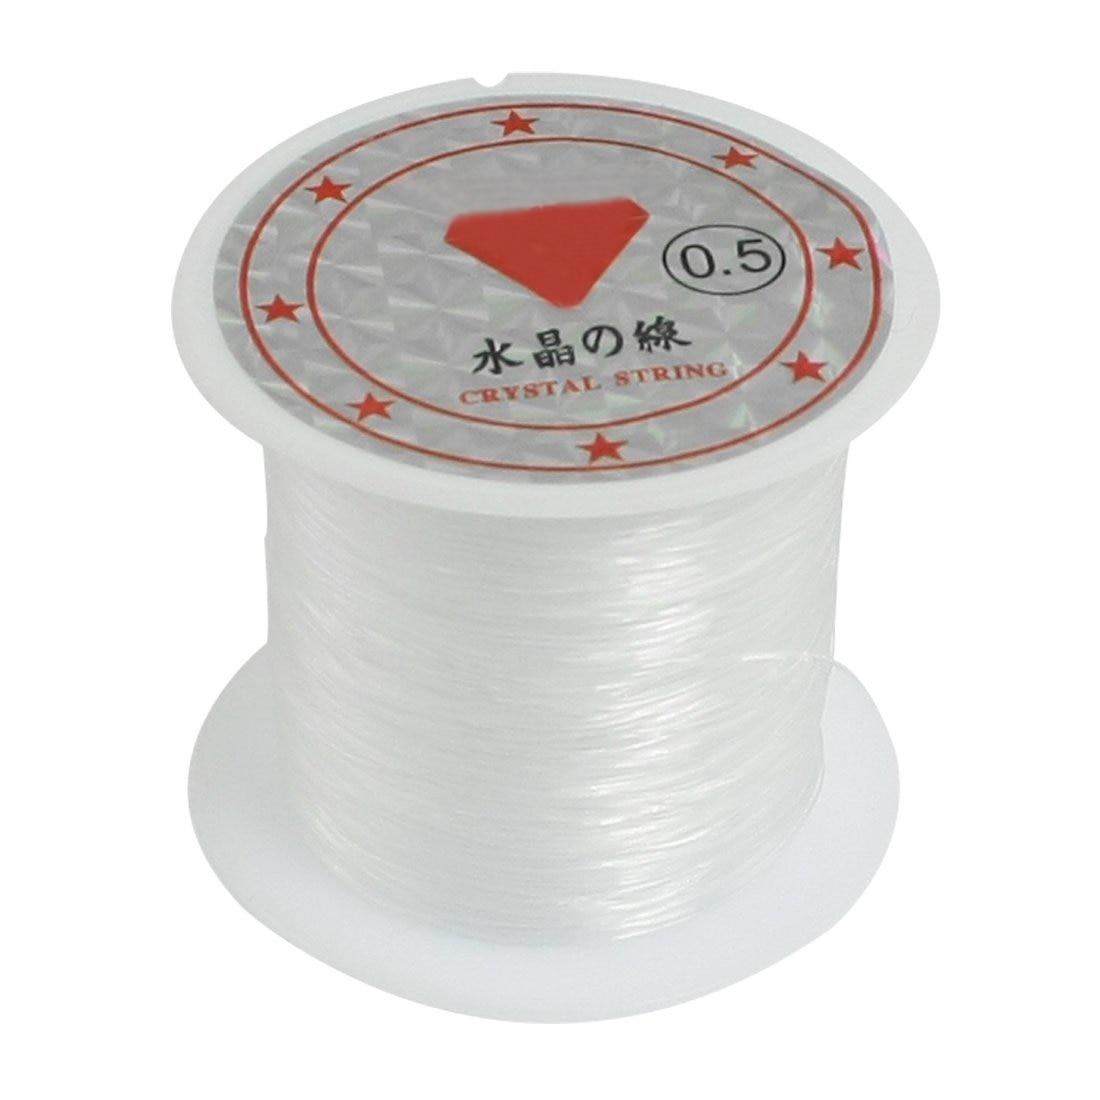 41lbs capacity diameter clear nylon fishing line for Nylon fishing line